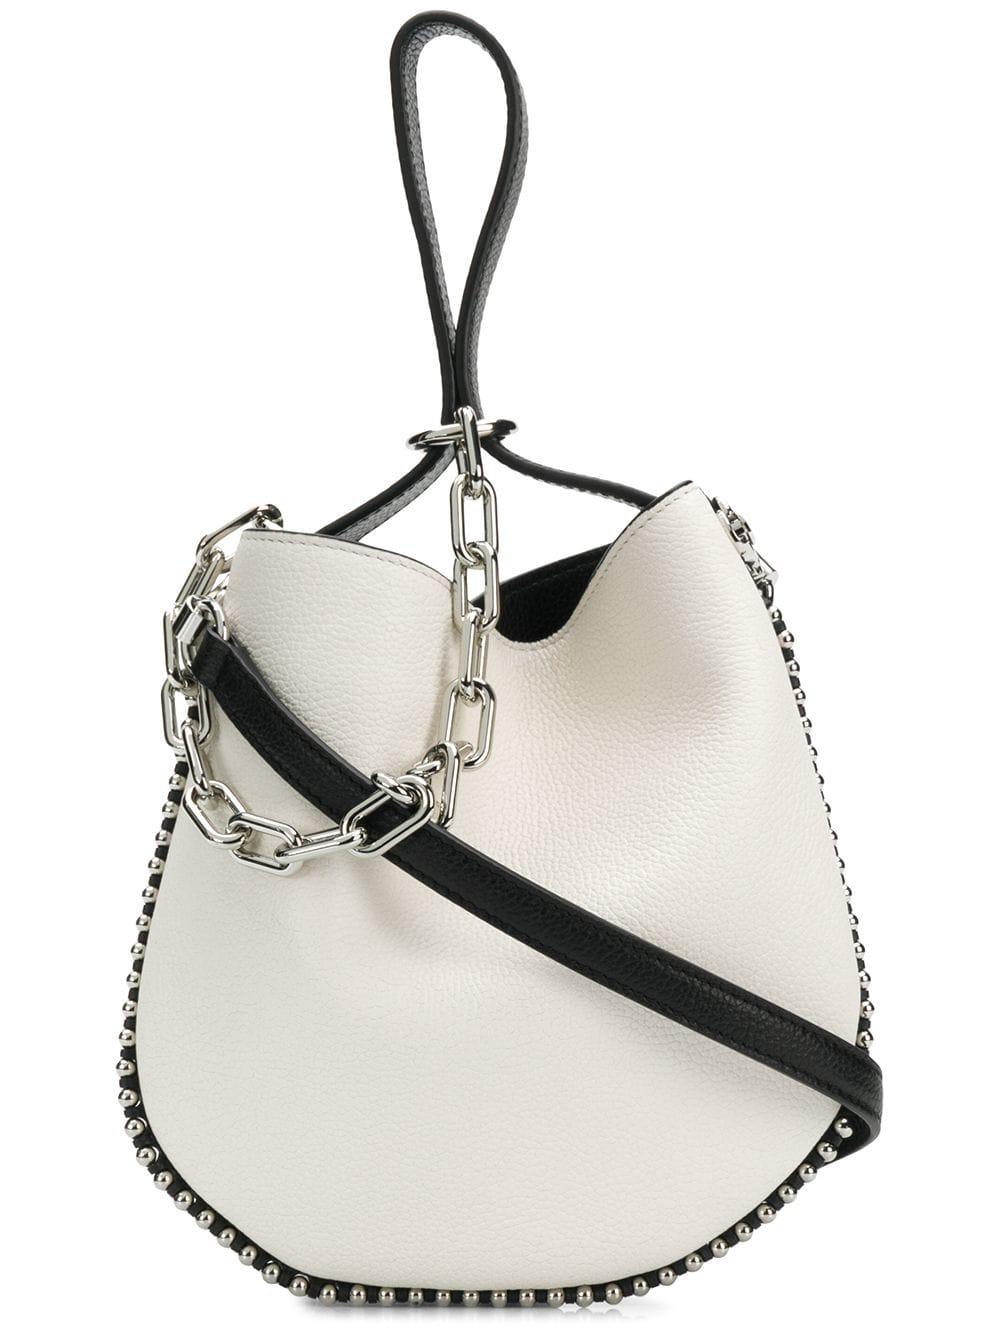 Mimma Ninni – Luxury and Fashion Shopping. Alexander Wang Roxy Mini ... 38a6d9bca4733